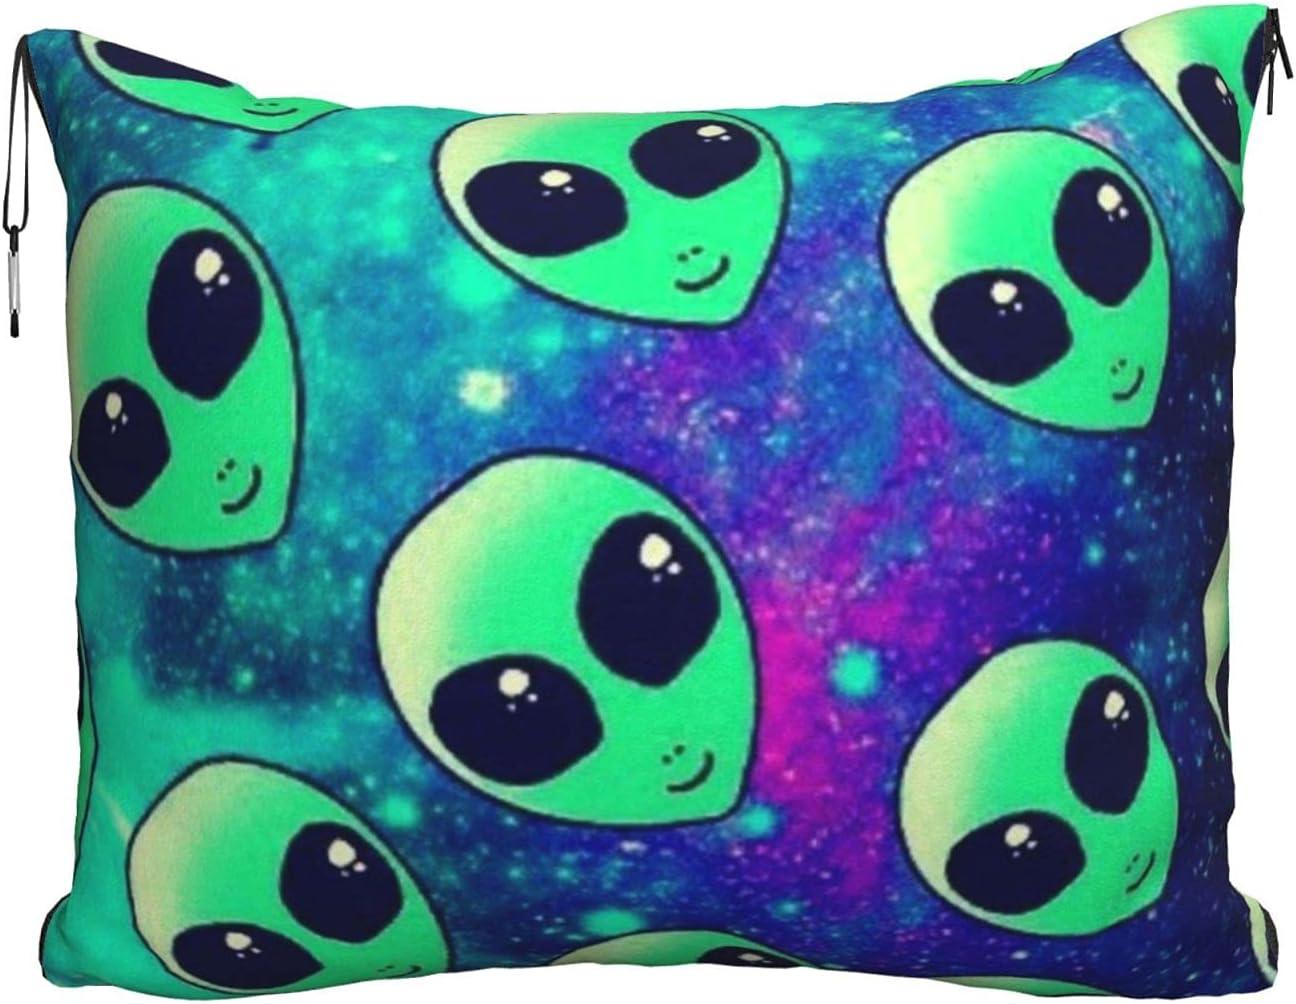 Mescchskgreen Alien Print Max 74% OFF Travel Pillow Combo Blanket Pil Wholesale